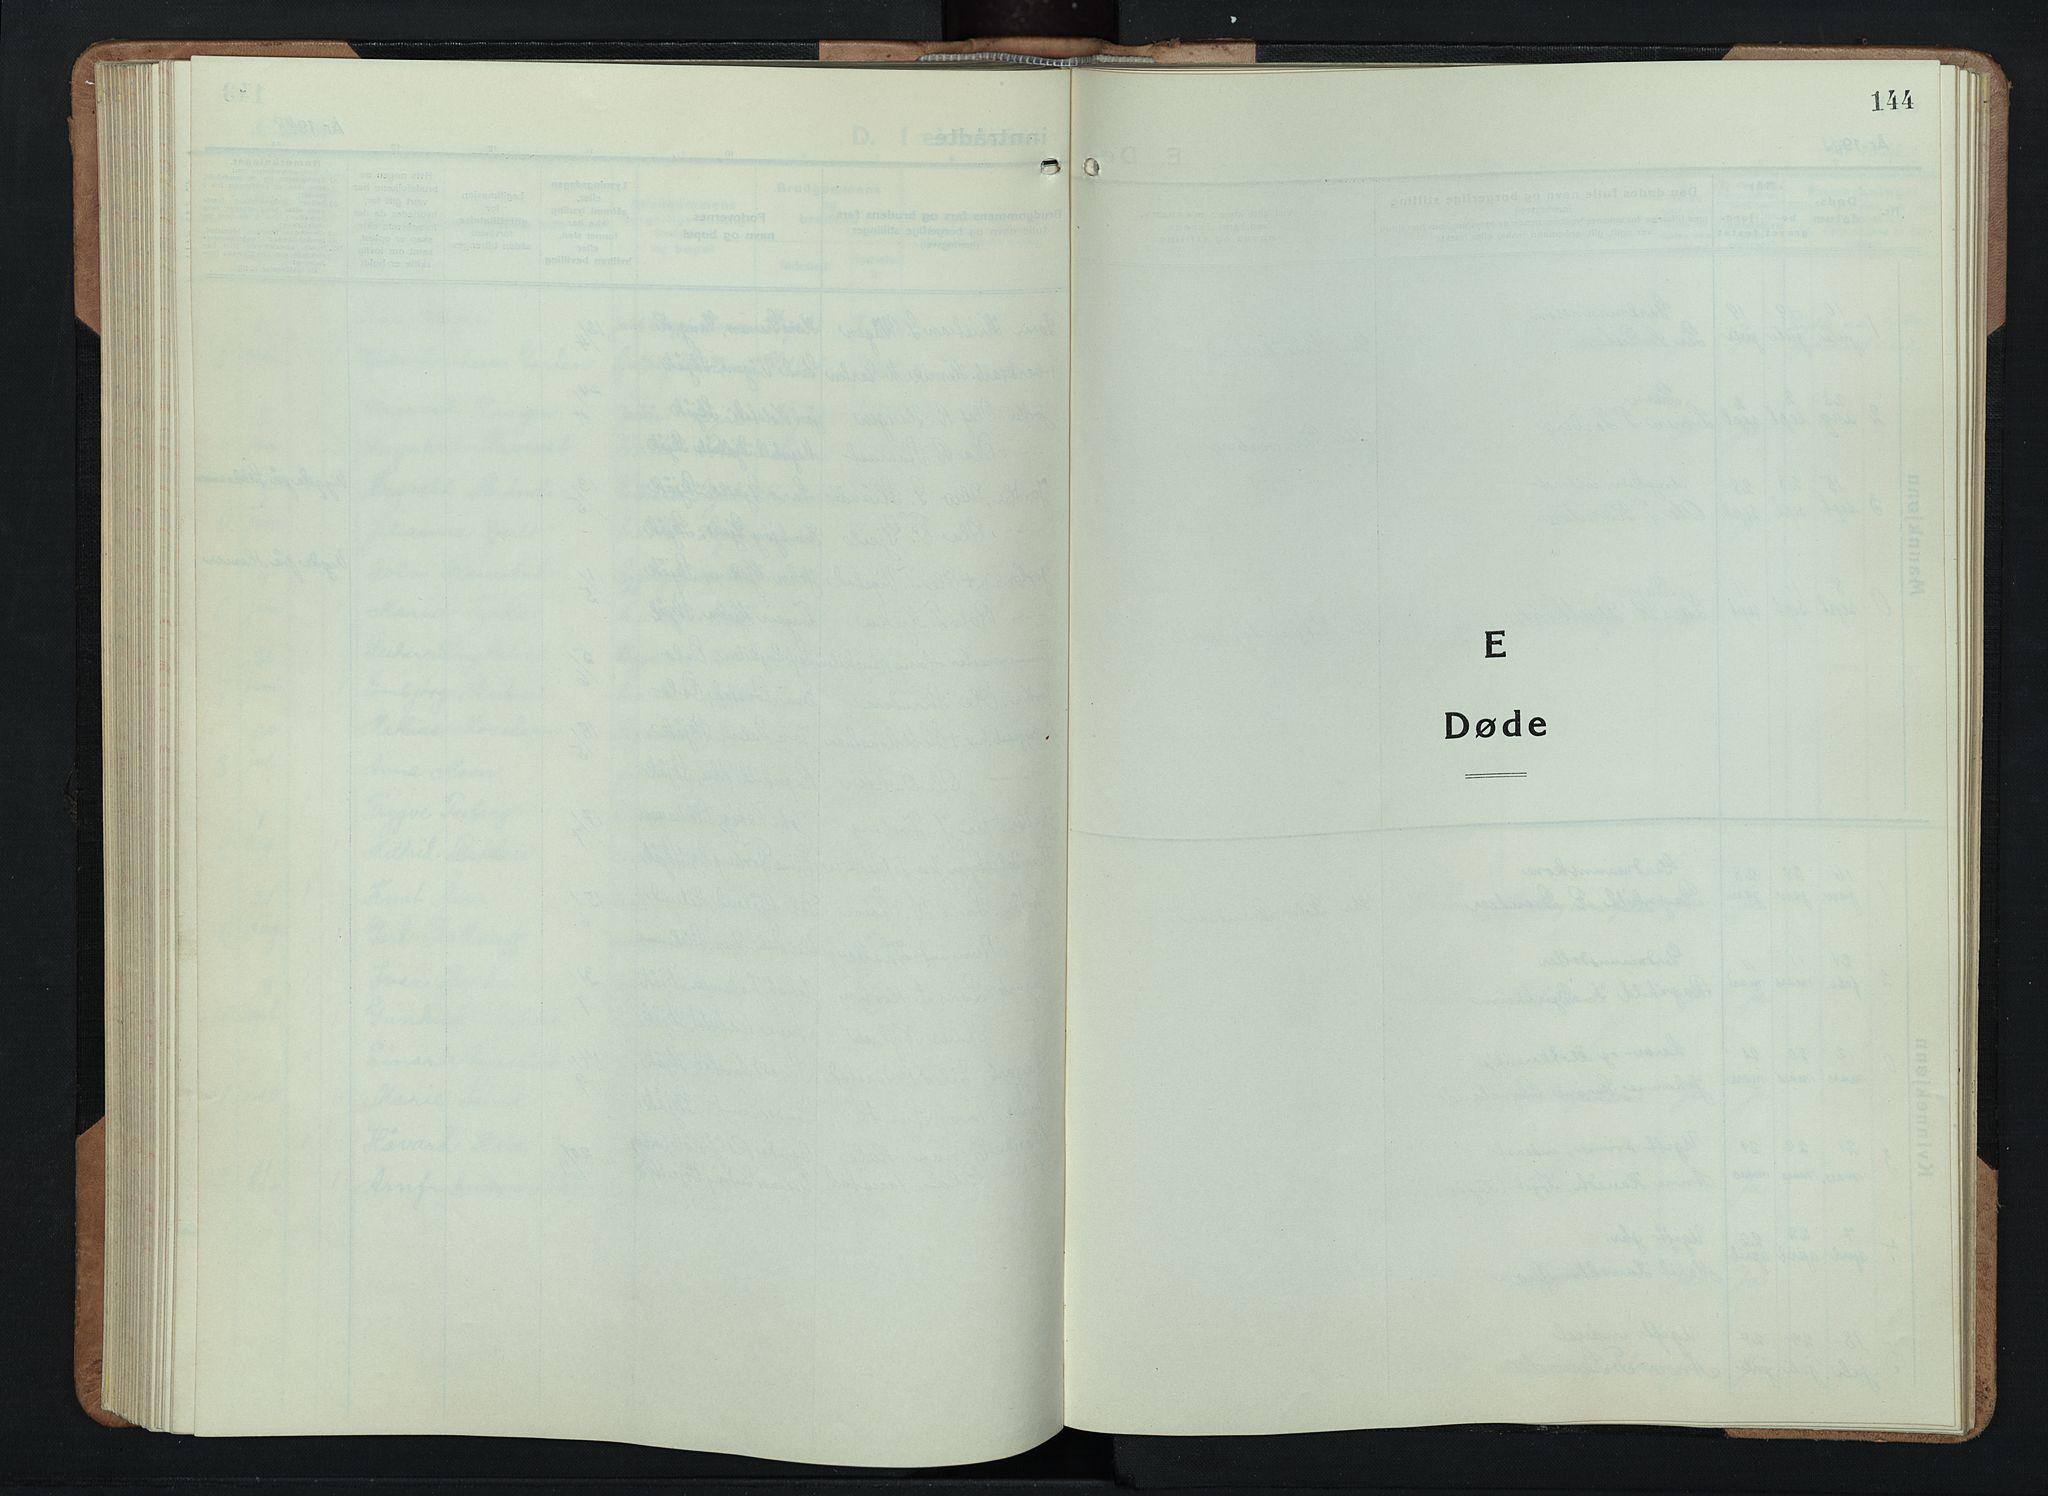 SAH, Skjåk prestekontor, Klokkerbok nr. 6, 1933-1954, s. 144